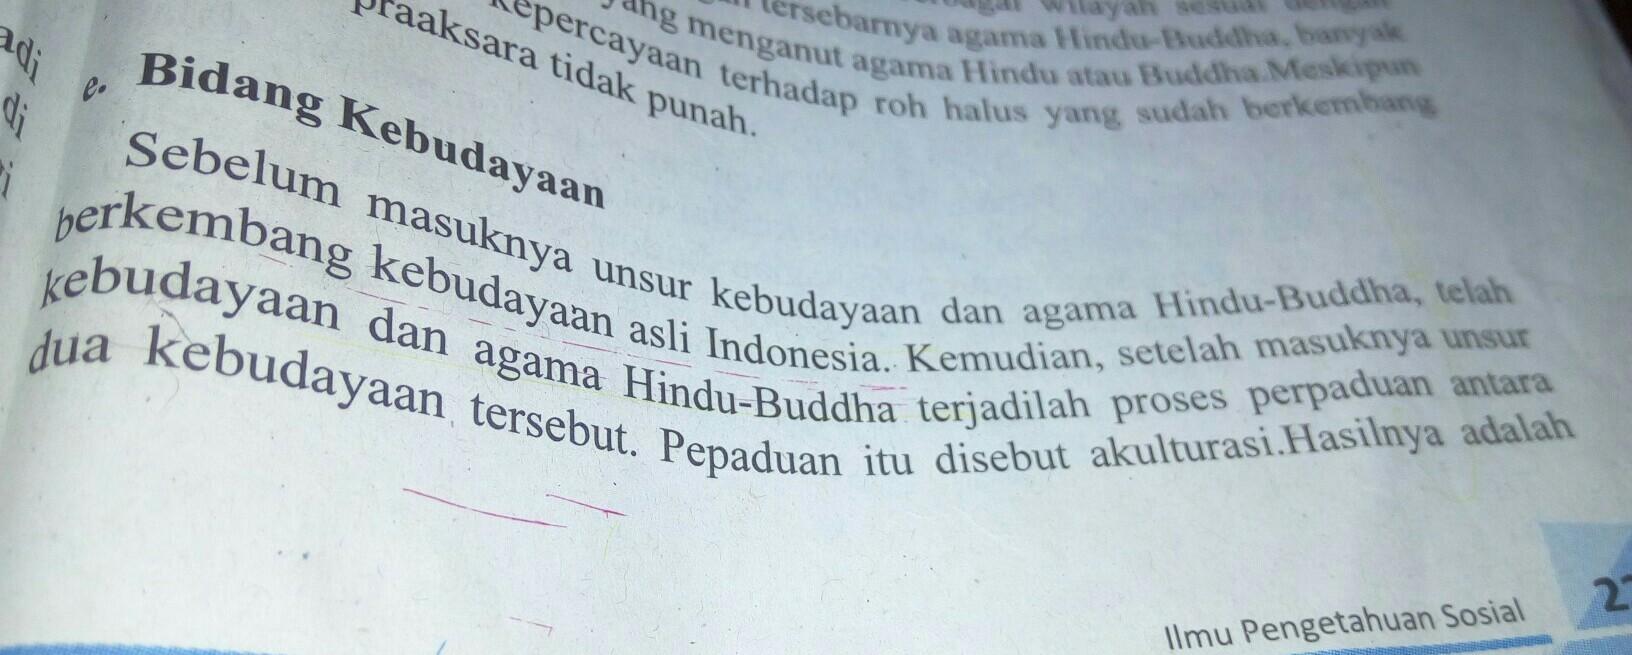 Berikan Contoh Pengaruh Kebudayaan Hindu Budha Dalam Sastra Di